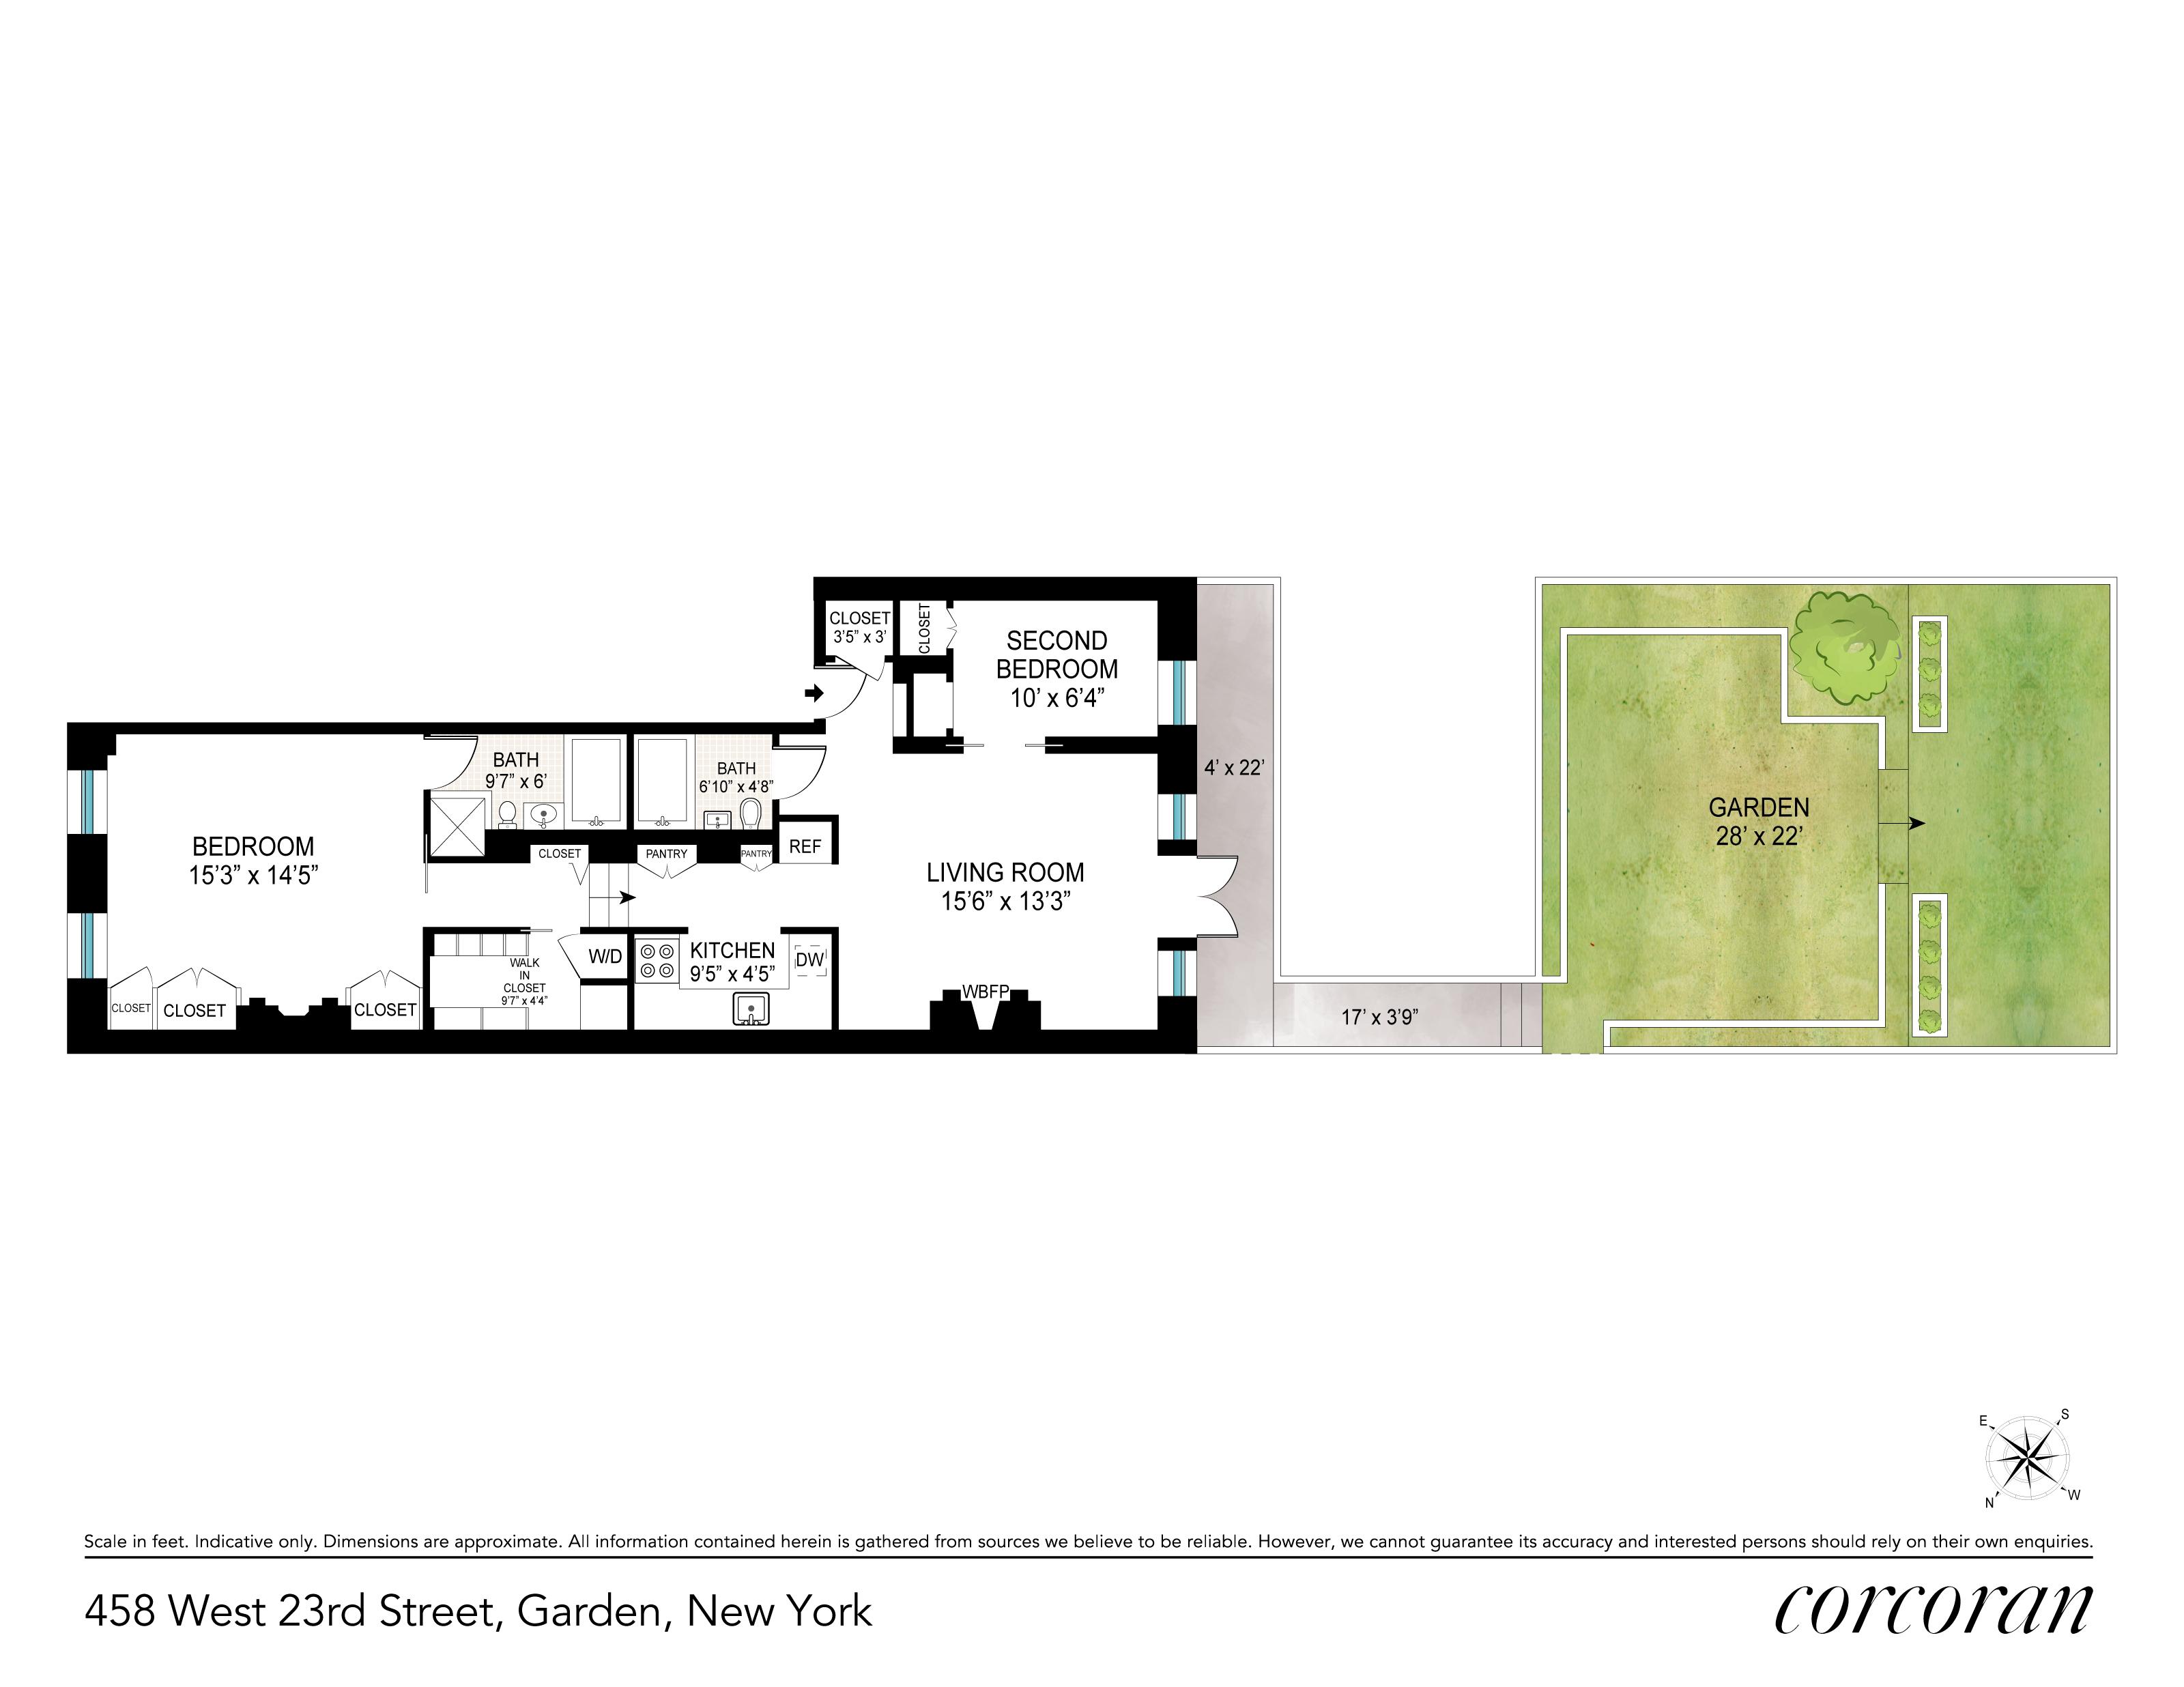 458 West 23rd Street Chelsea New York NY 10011